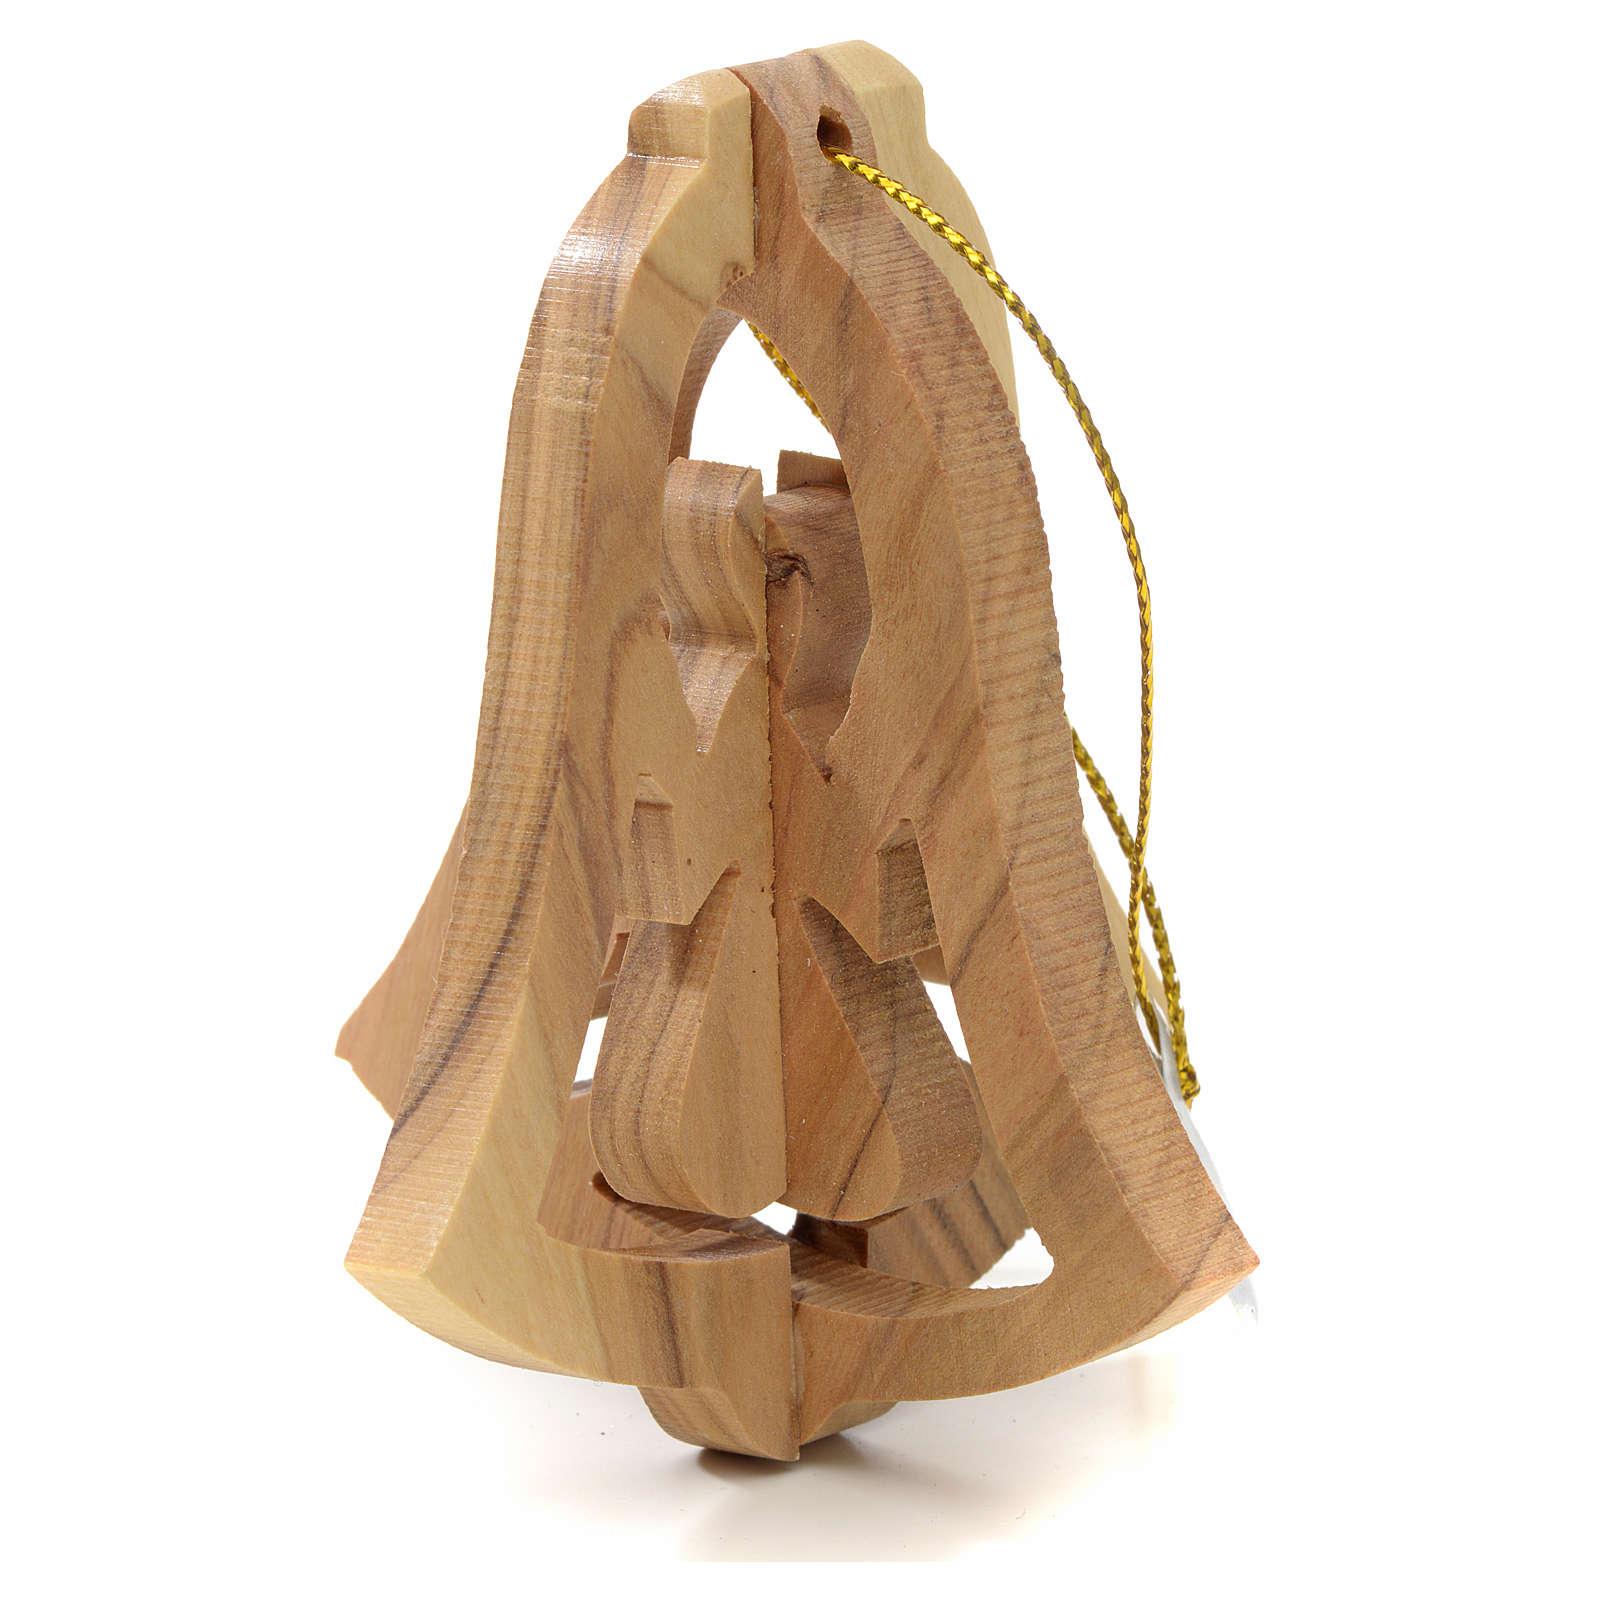 Addobbo albero olivo Terrasanta campana angelo 4